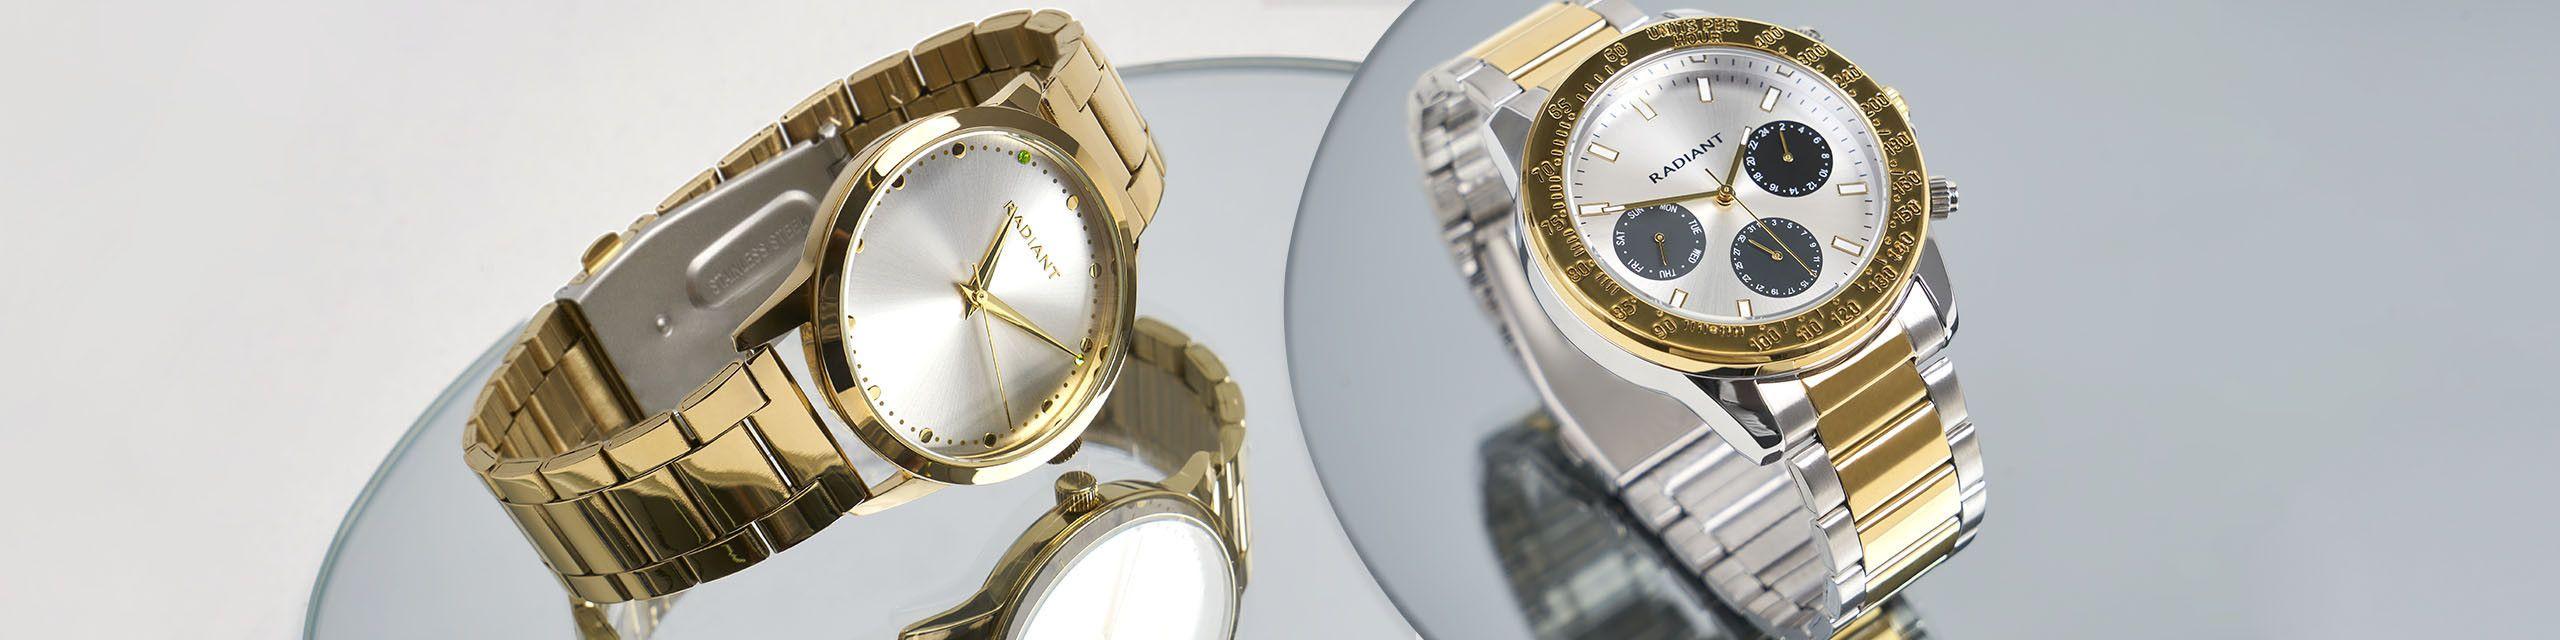 Relógios femininos ▷ New Collection 2021 - Radiant Portugal